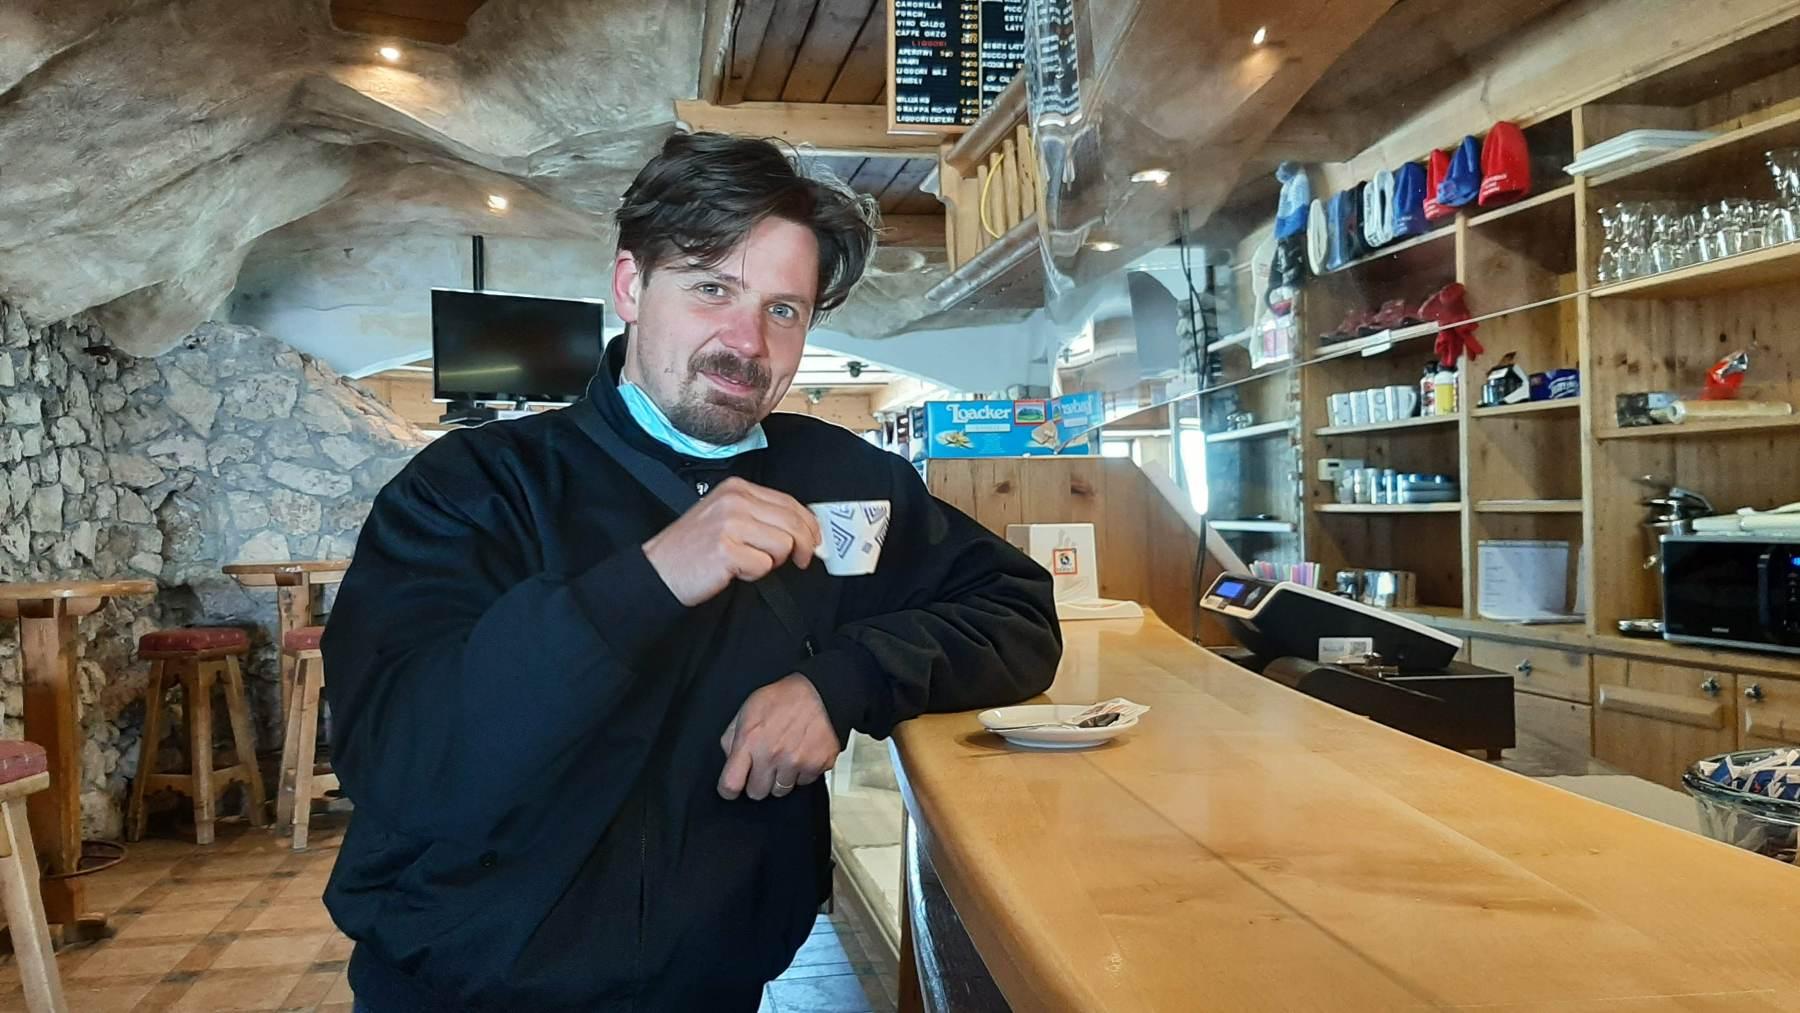 Marek a café na baru